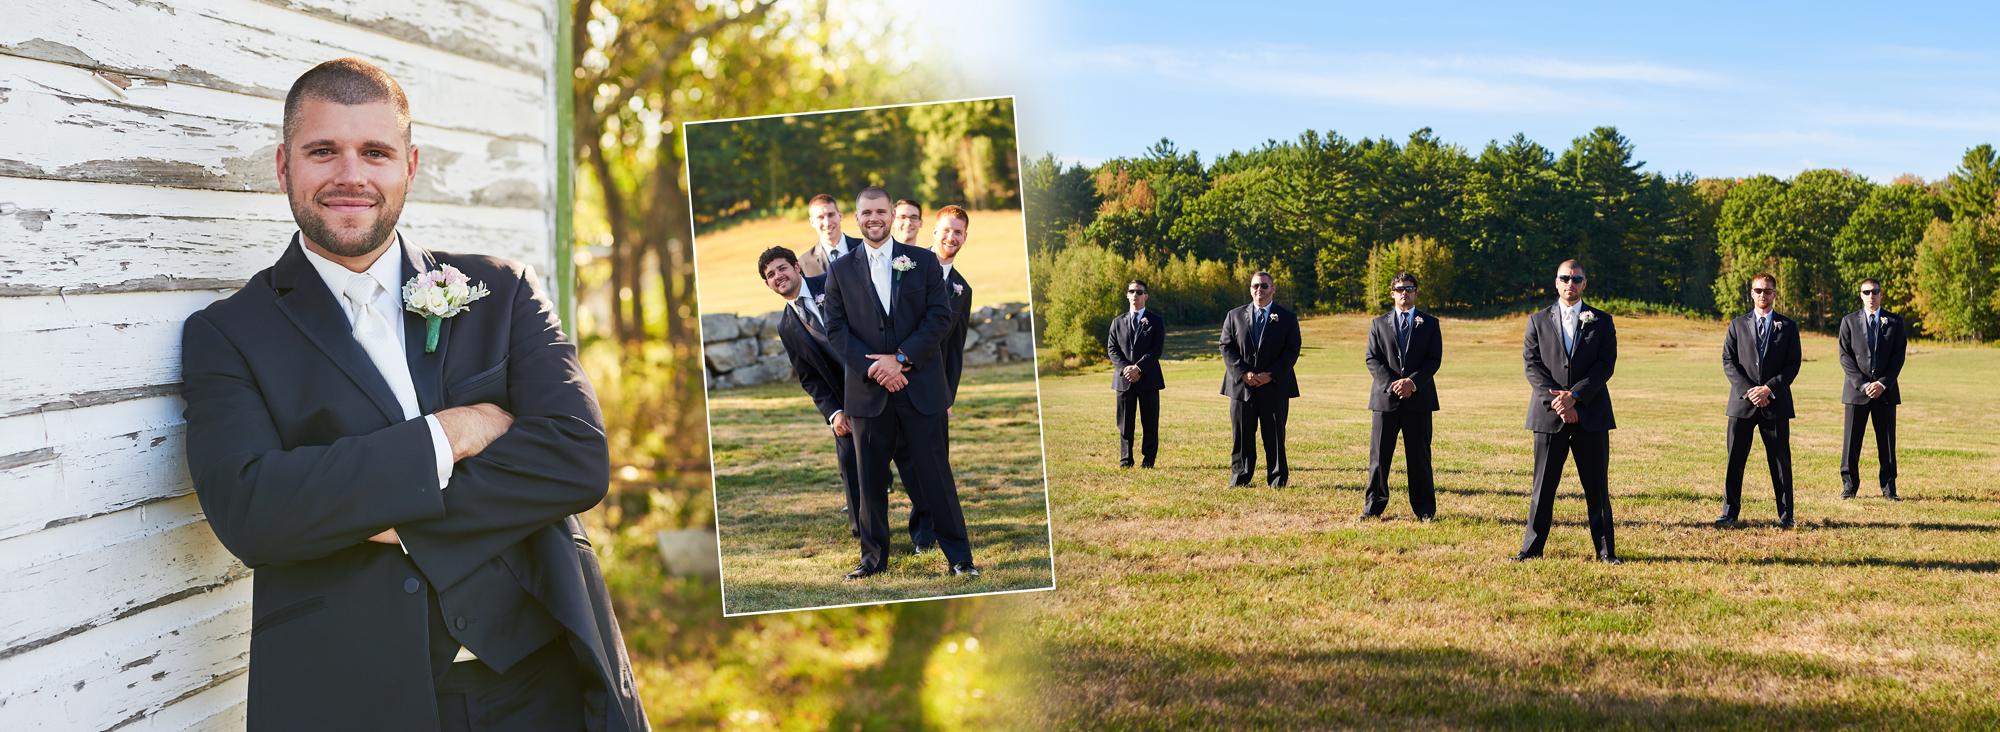 Dave_Soucy_APM_wedding_photography.031.jpg